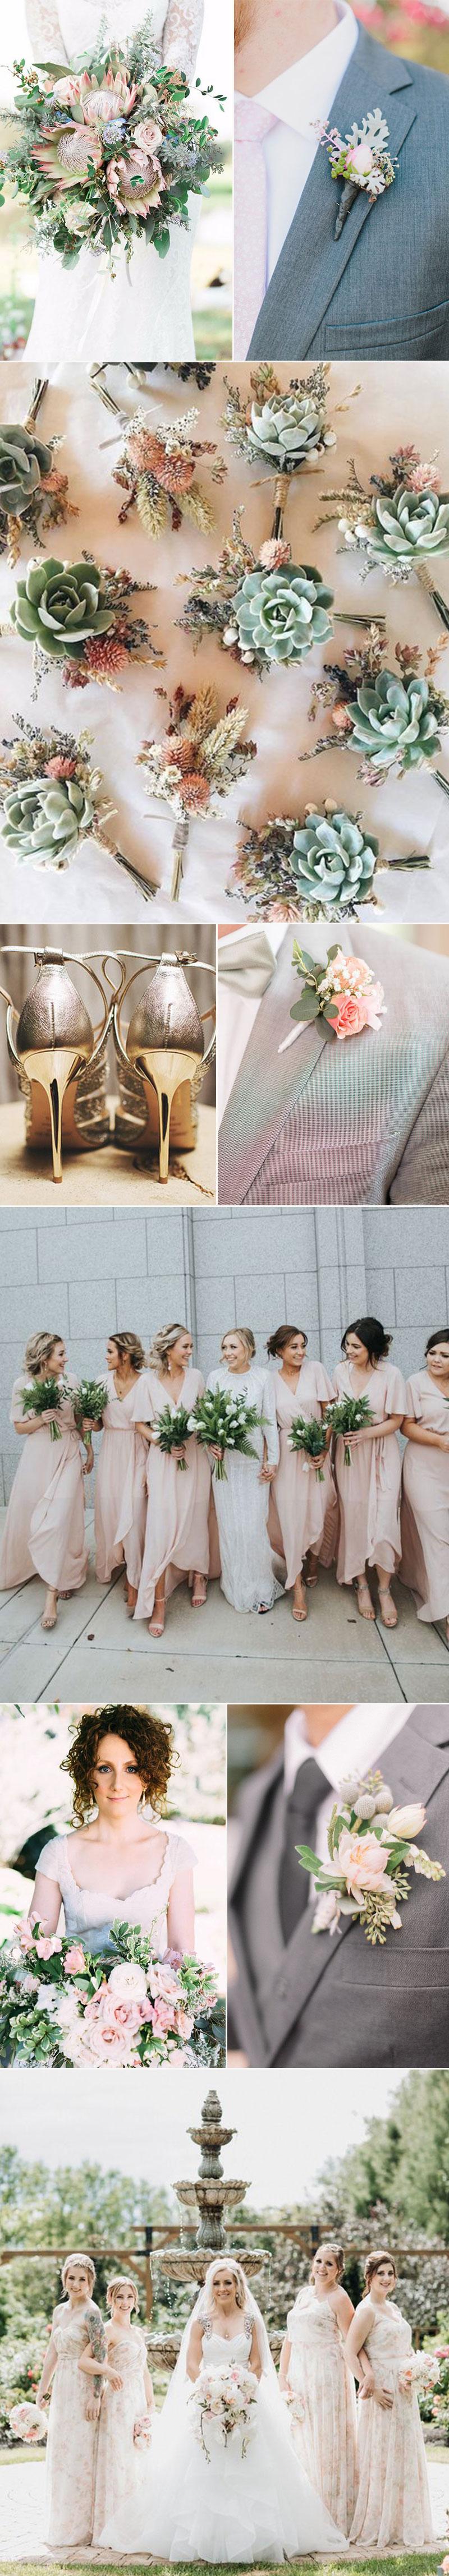 Pastel Pink Weddings